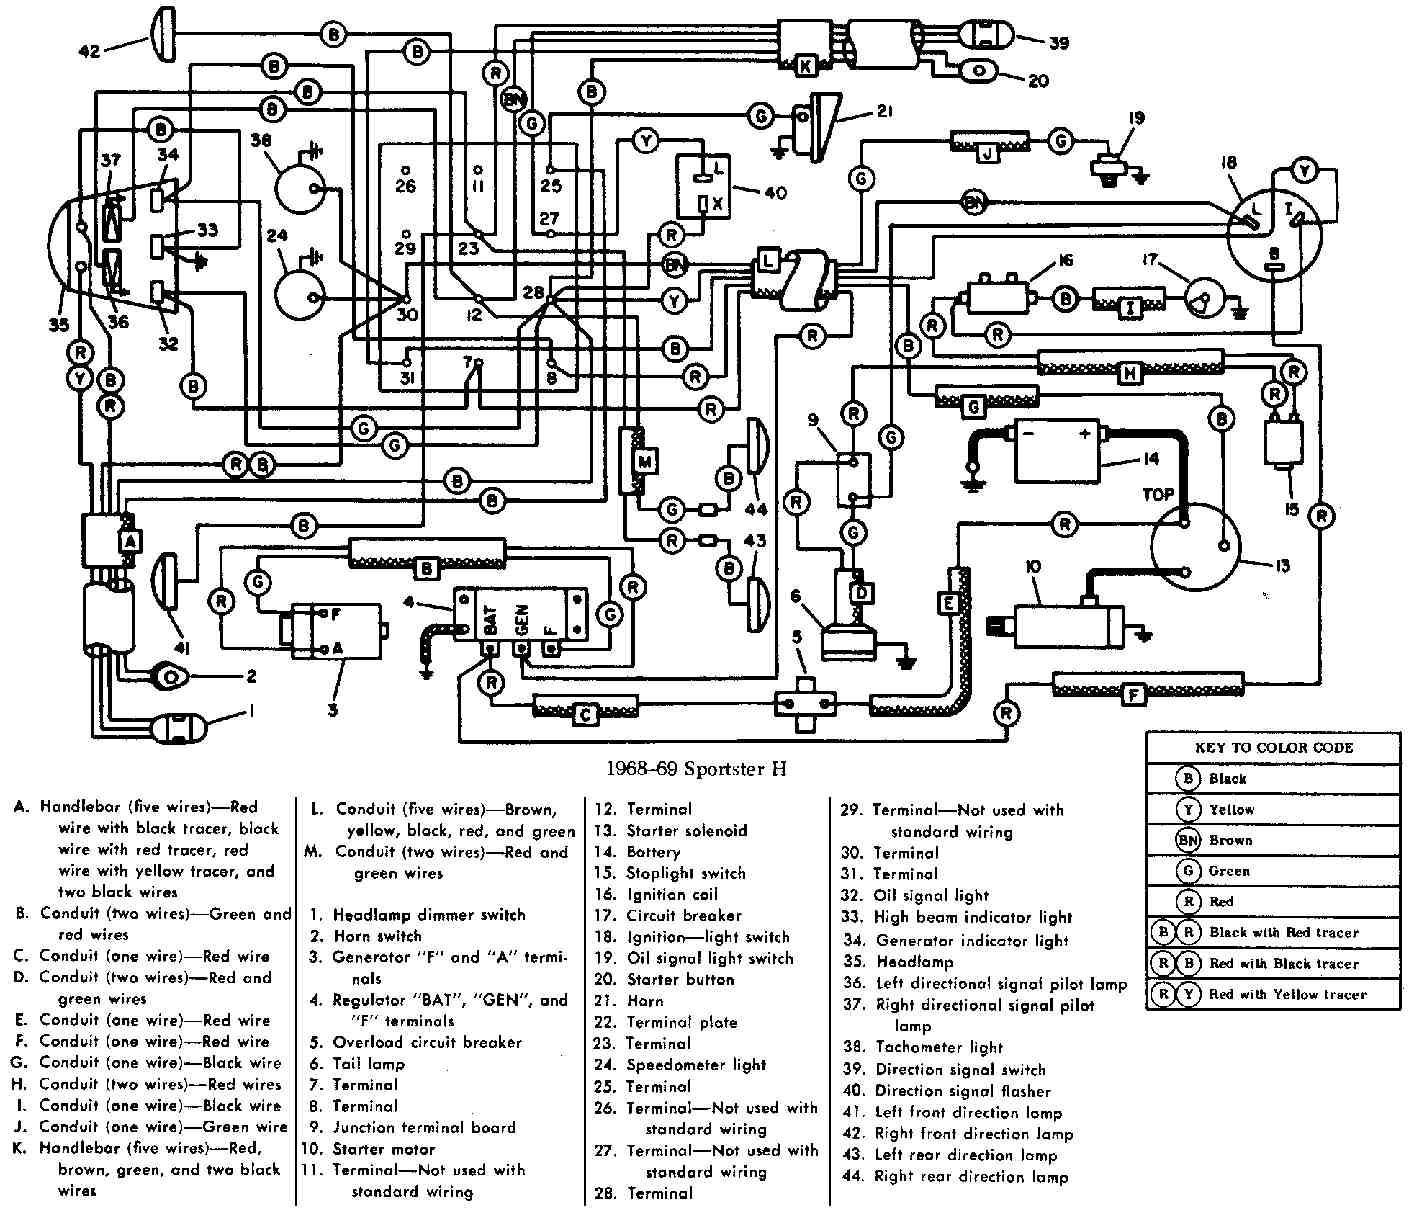 1973 flh wiring diagram dash wiring diagram autovehiclewiring diagrams online 6503 harley davidson forums wiring diagram [ 1409 x 1218 Pixel ]